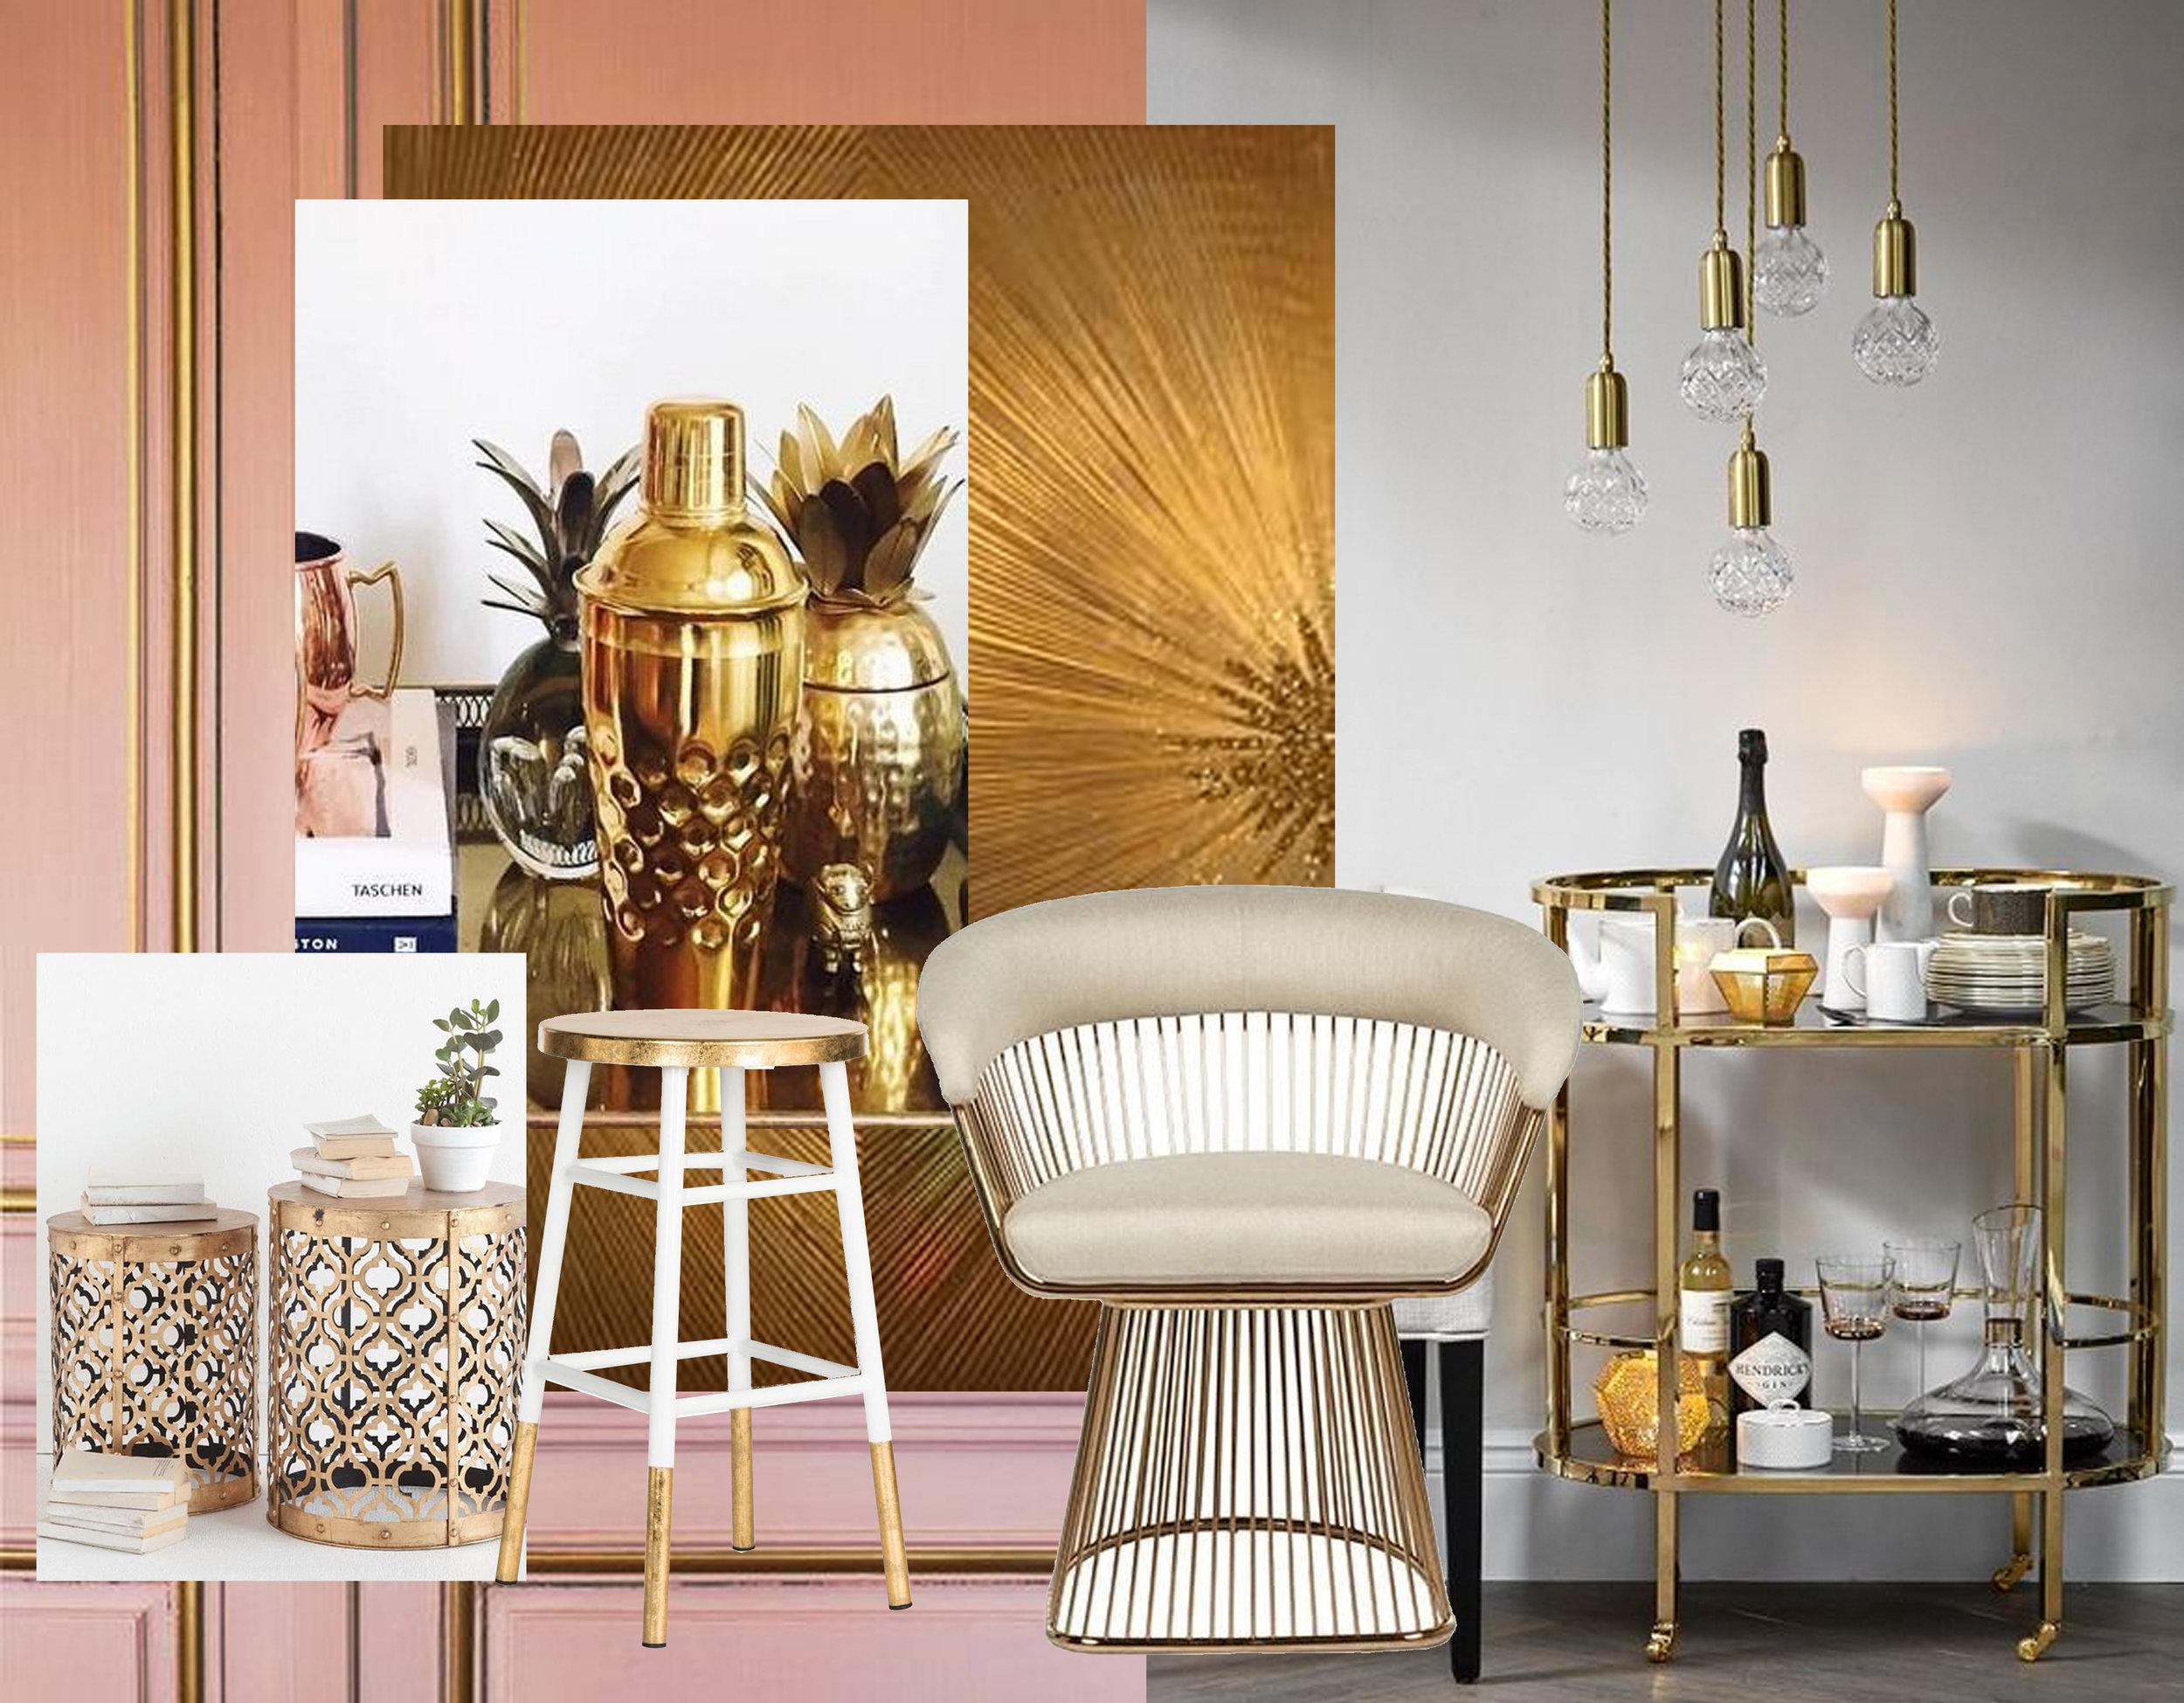 Gabriel counter stool  Domino  -golden cocktail shaker  Anthropology  - Eva armchair  Globe West  - golden drink trolley via  Home Girl London